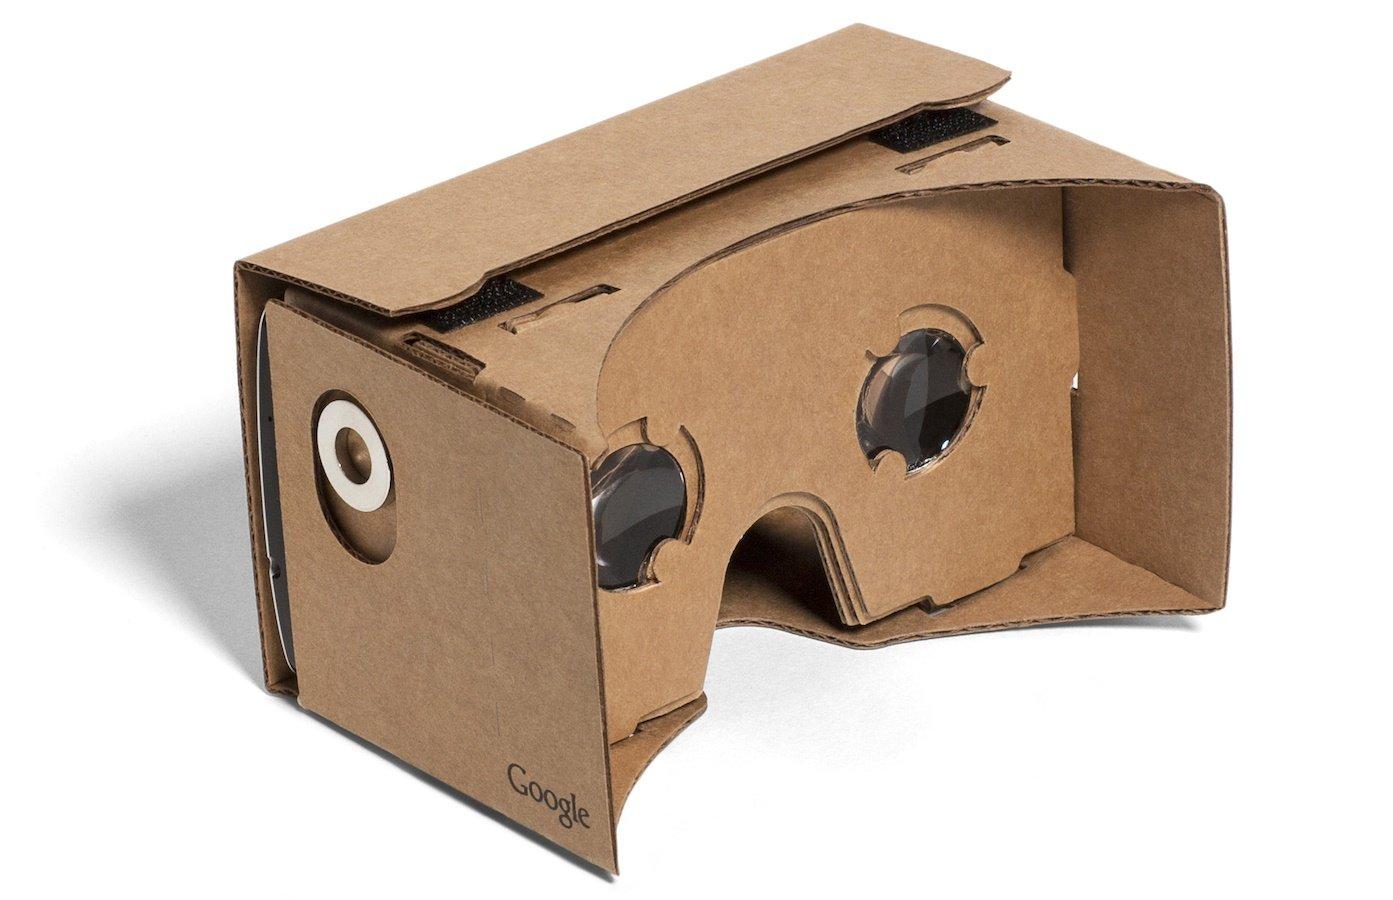 google-cardboard-virtual-reality-vr-pc-tablet-media